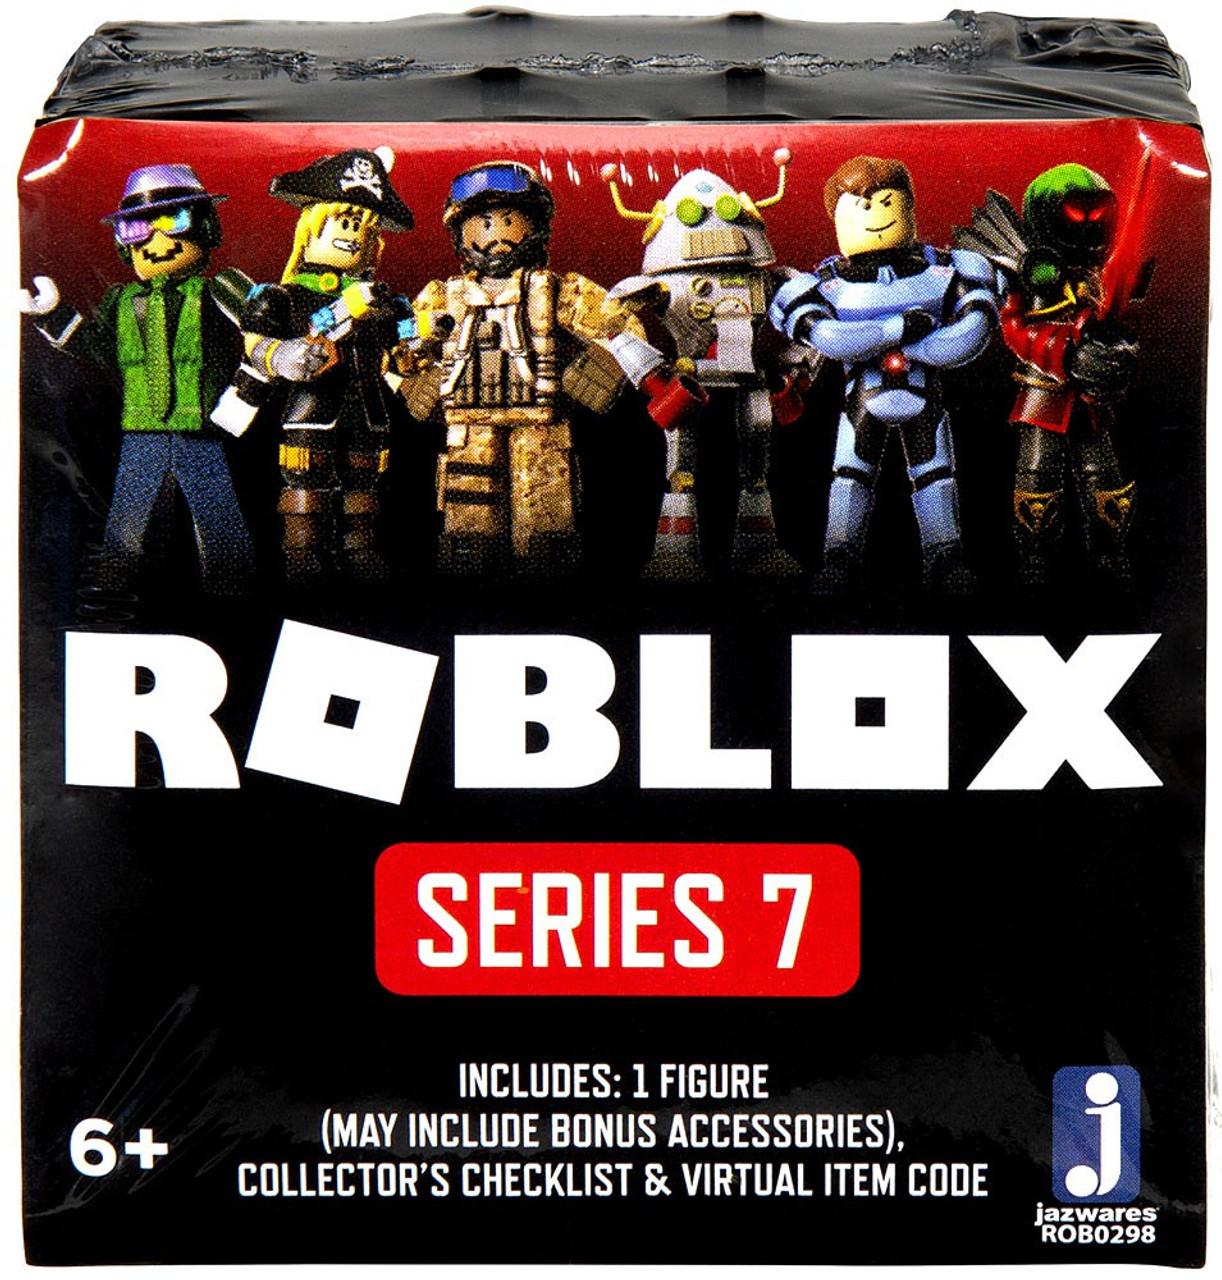 Pikachu Clothes Girl Roblox Code Roblox Series 7 Mystery Pack Black Cube 1 Random Figure Virtual Item Code Jazwares Toywiz